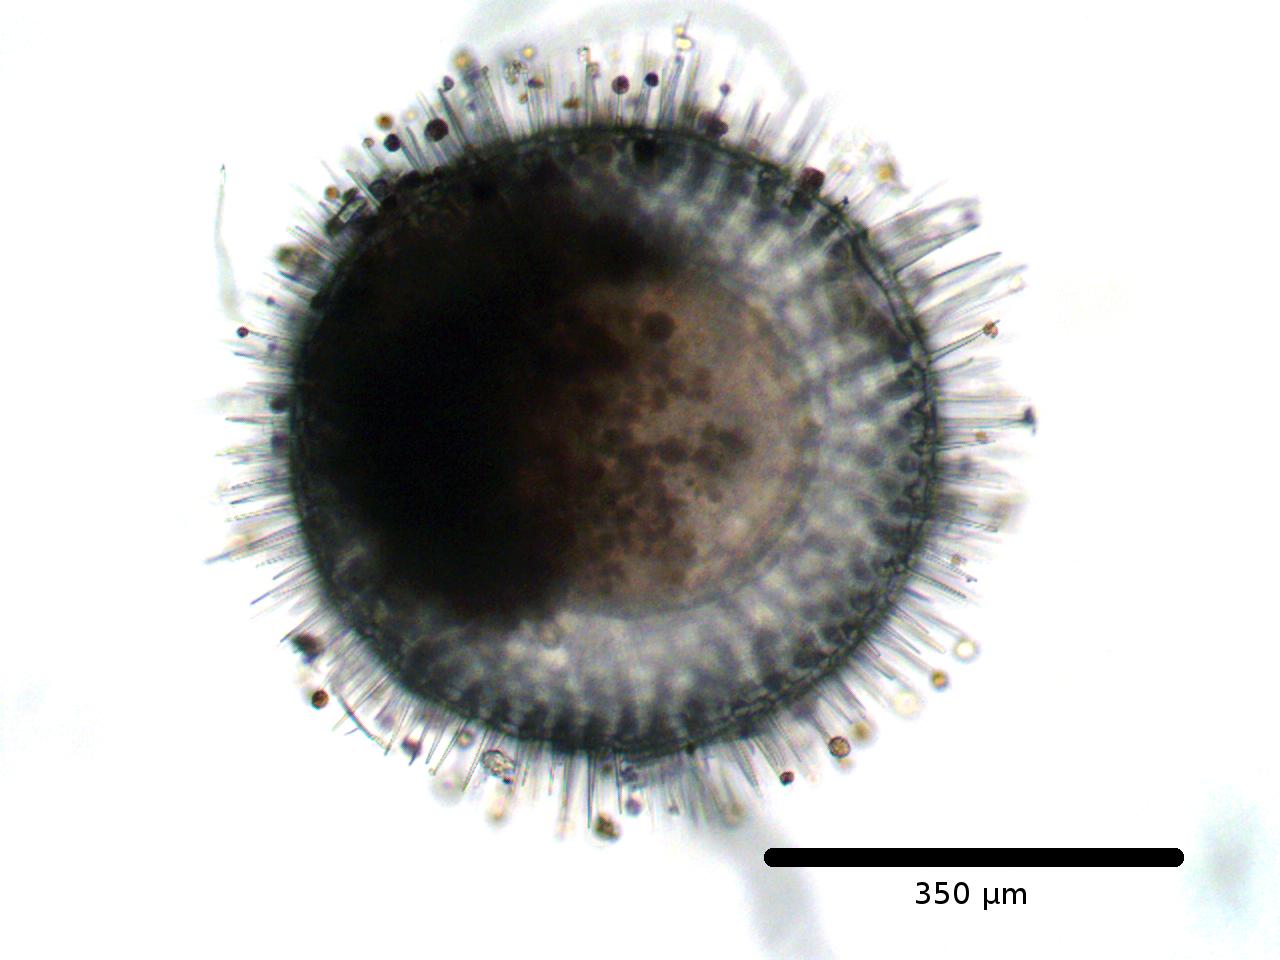 A Phaodarian radiolarian collected off the coast of California